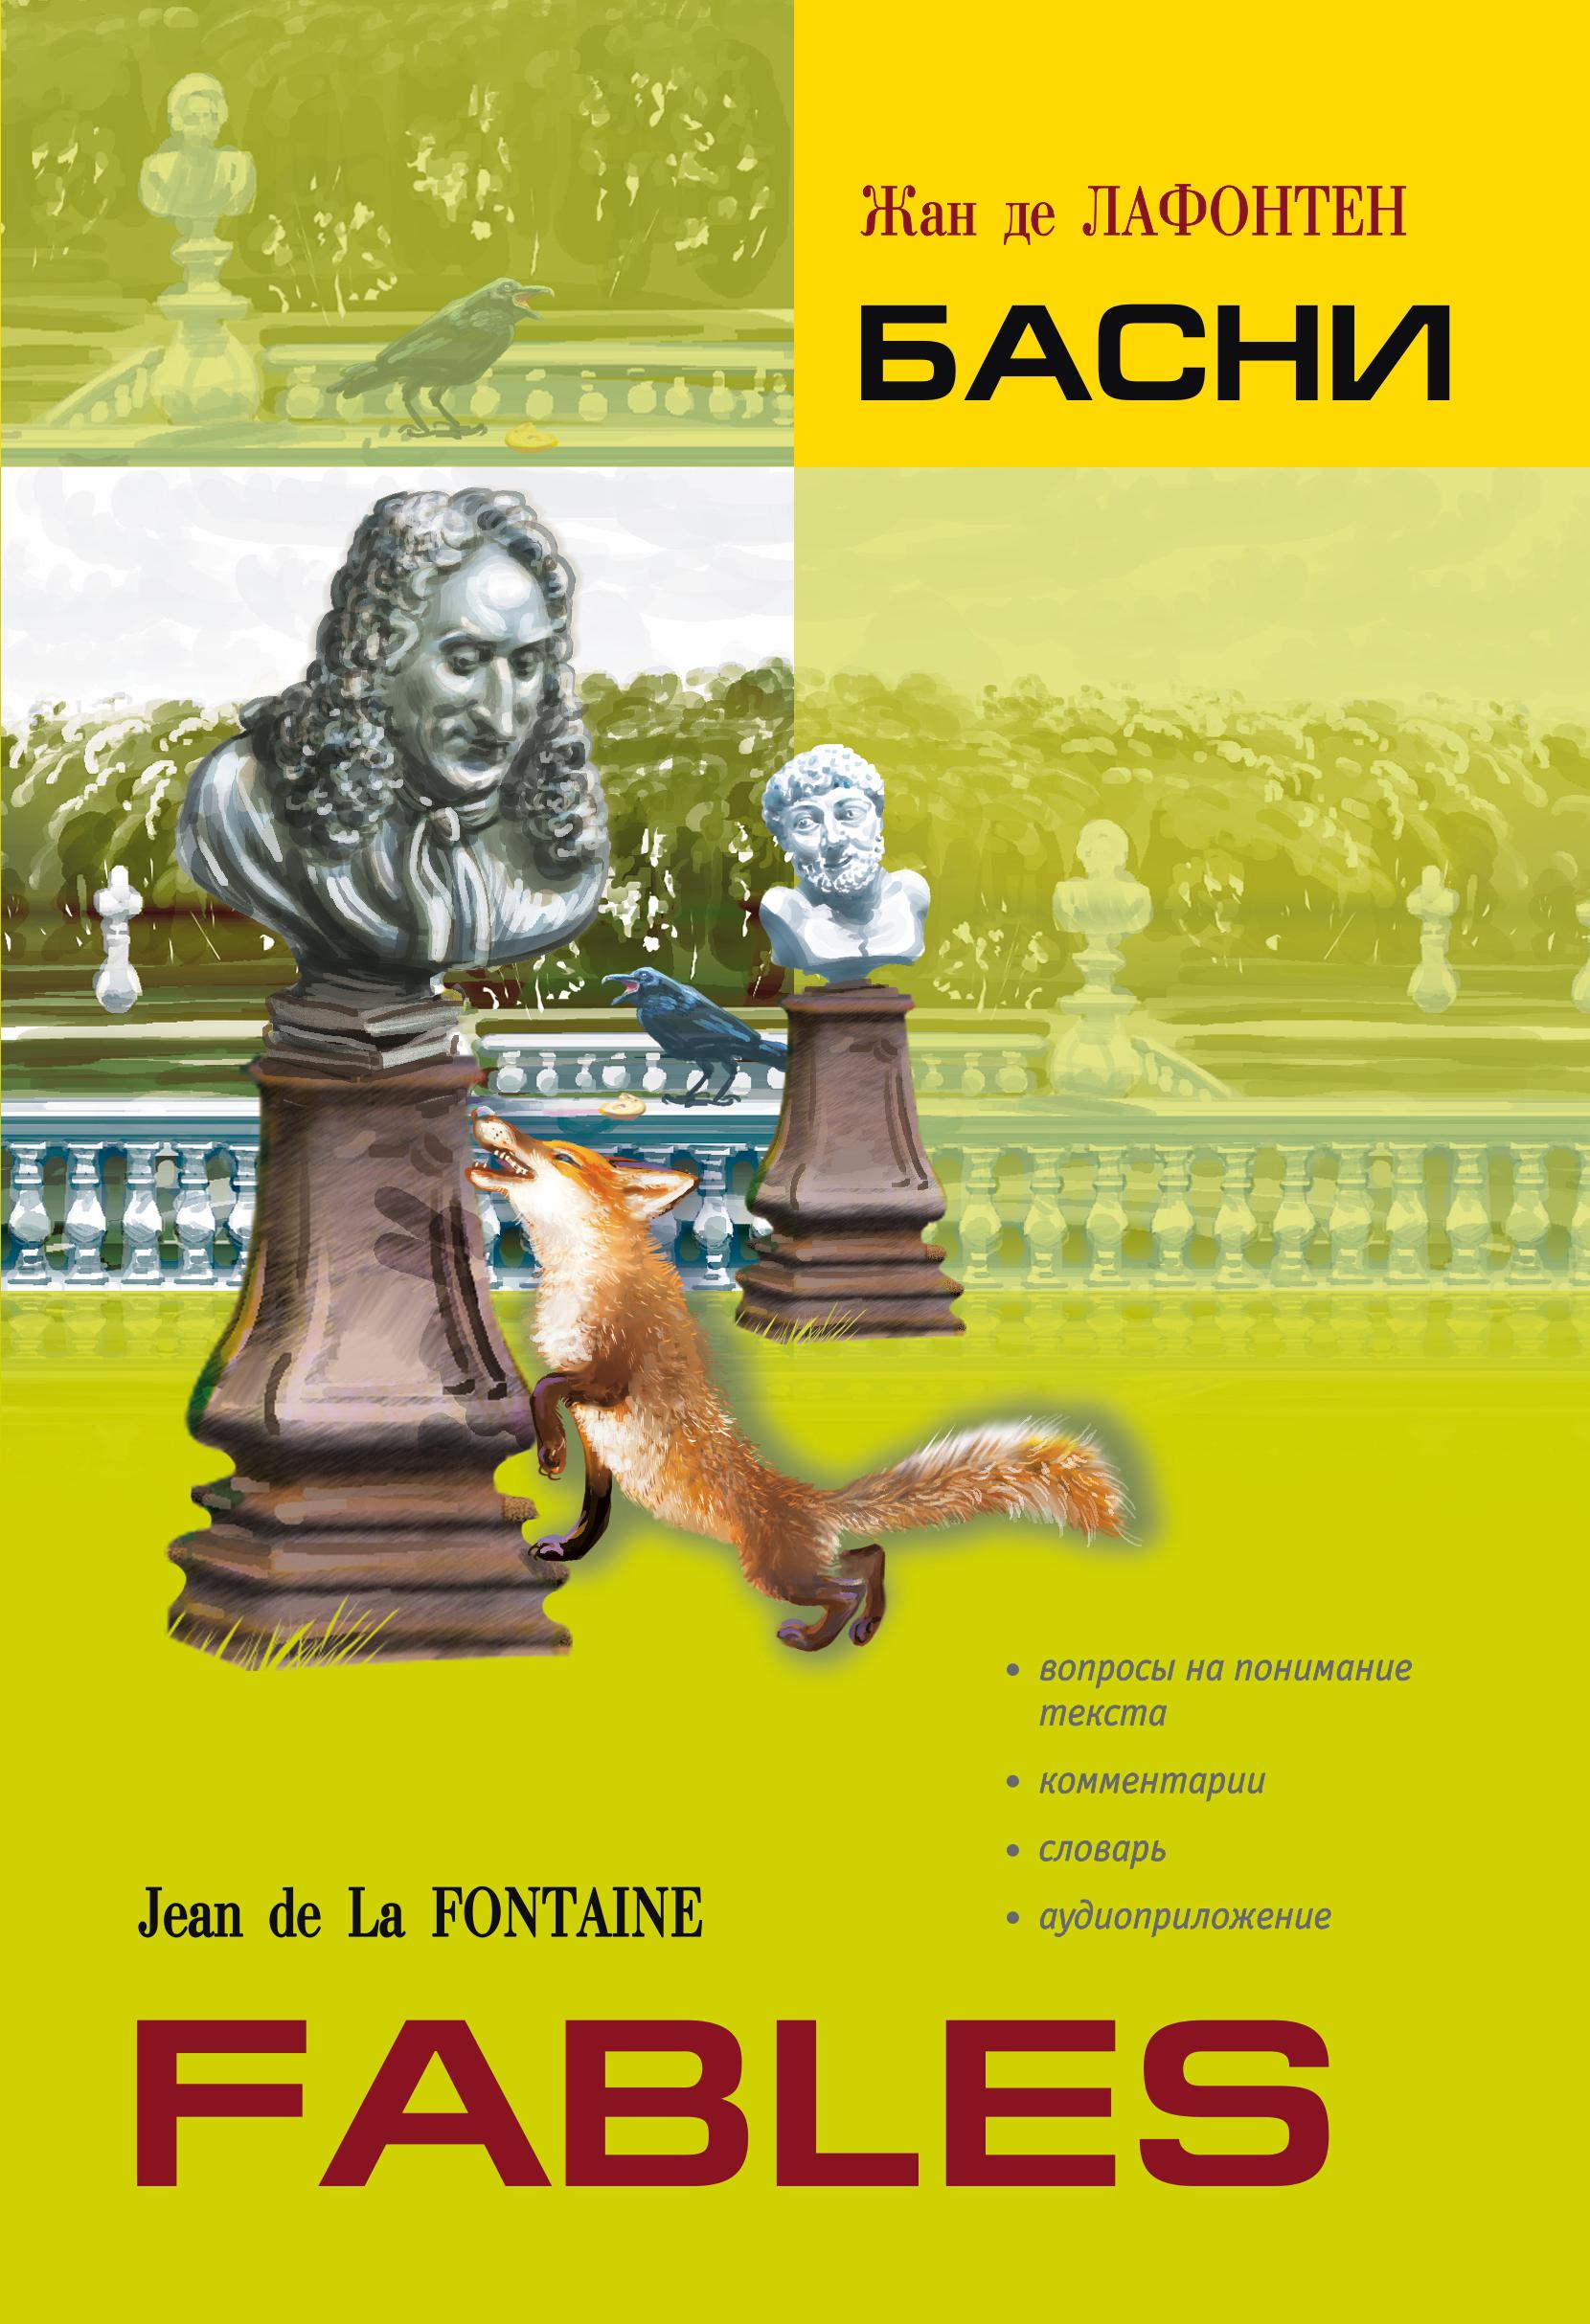 Жан де Лафонтен Басни. Книга для чтения на французском языке simenon g las caves du majestic книга для чтения на французском языке